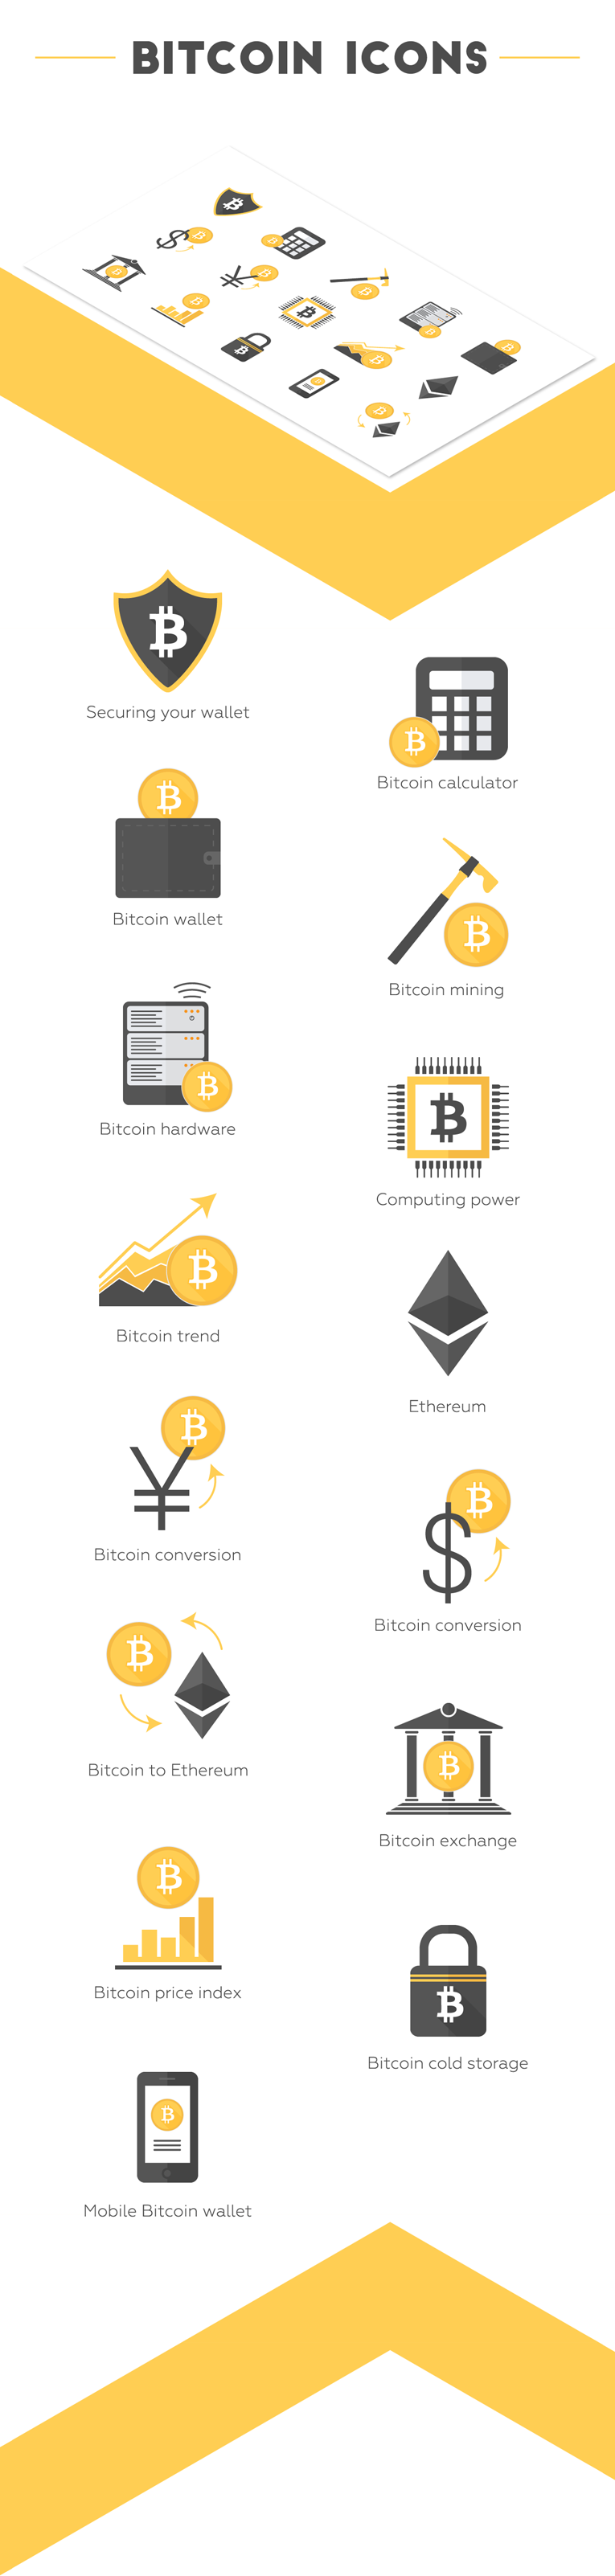 Bitcoins icons